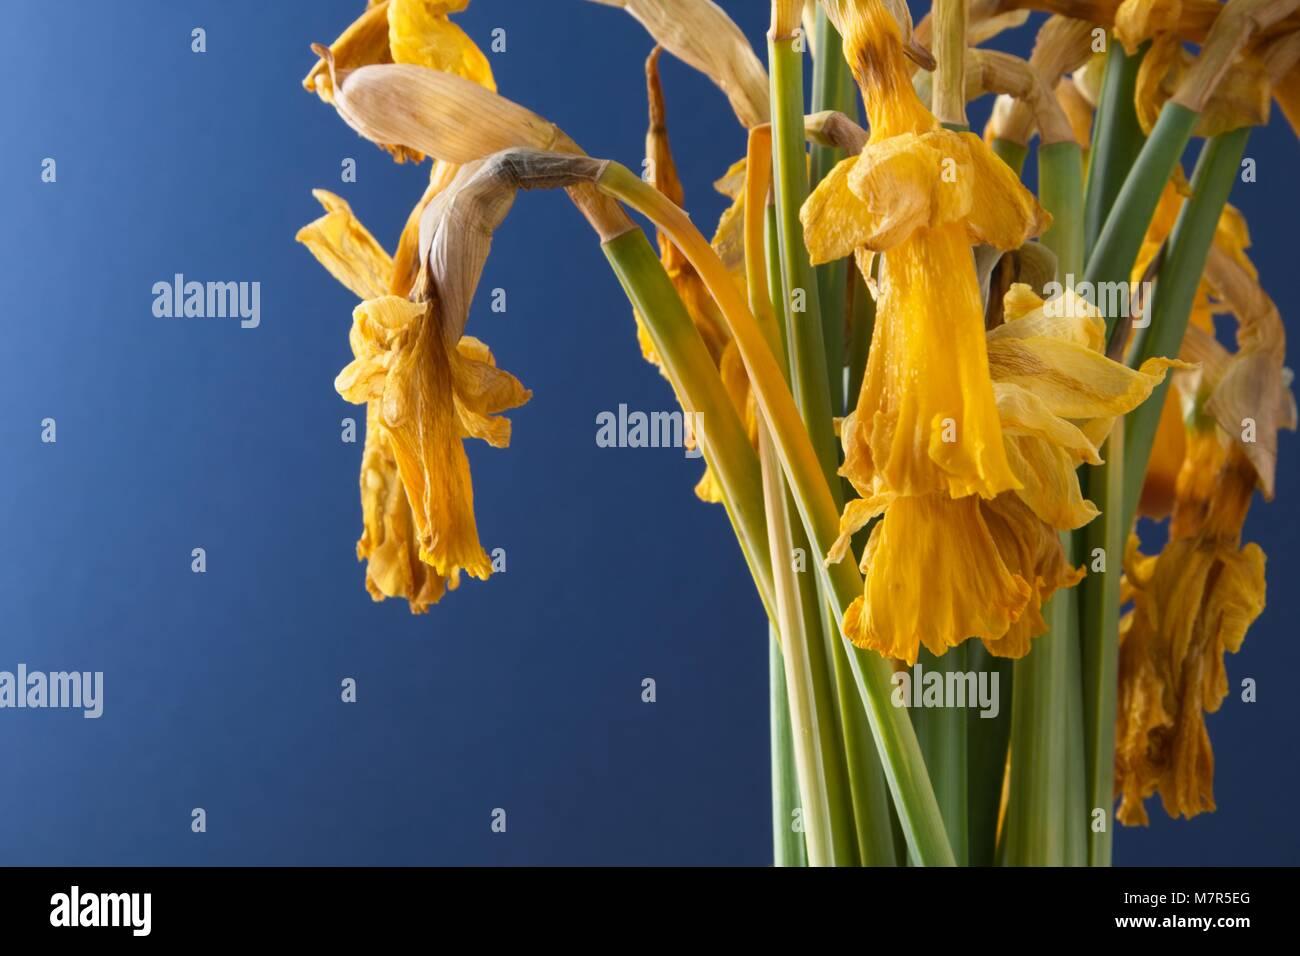 Dead Daffodil Flower Stock Photos Dead Daffodil Flower Stock